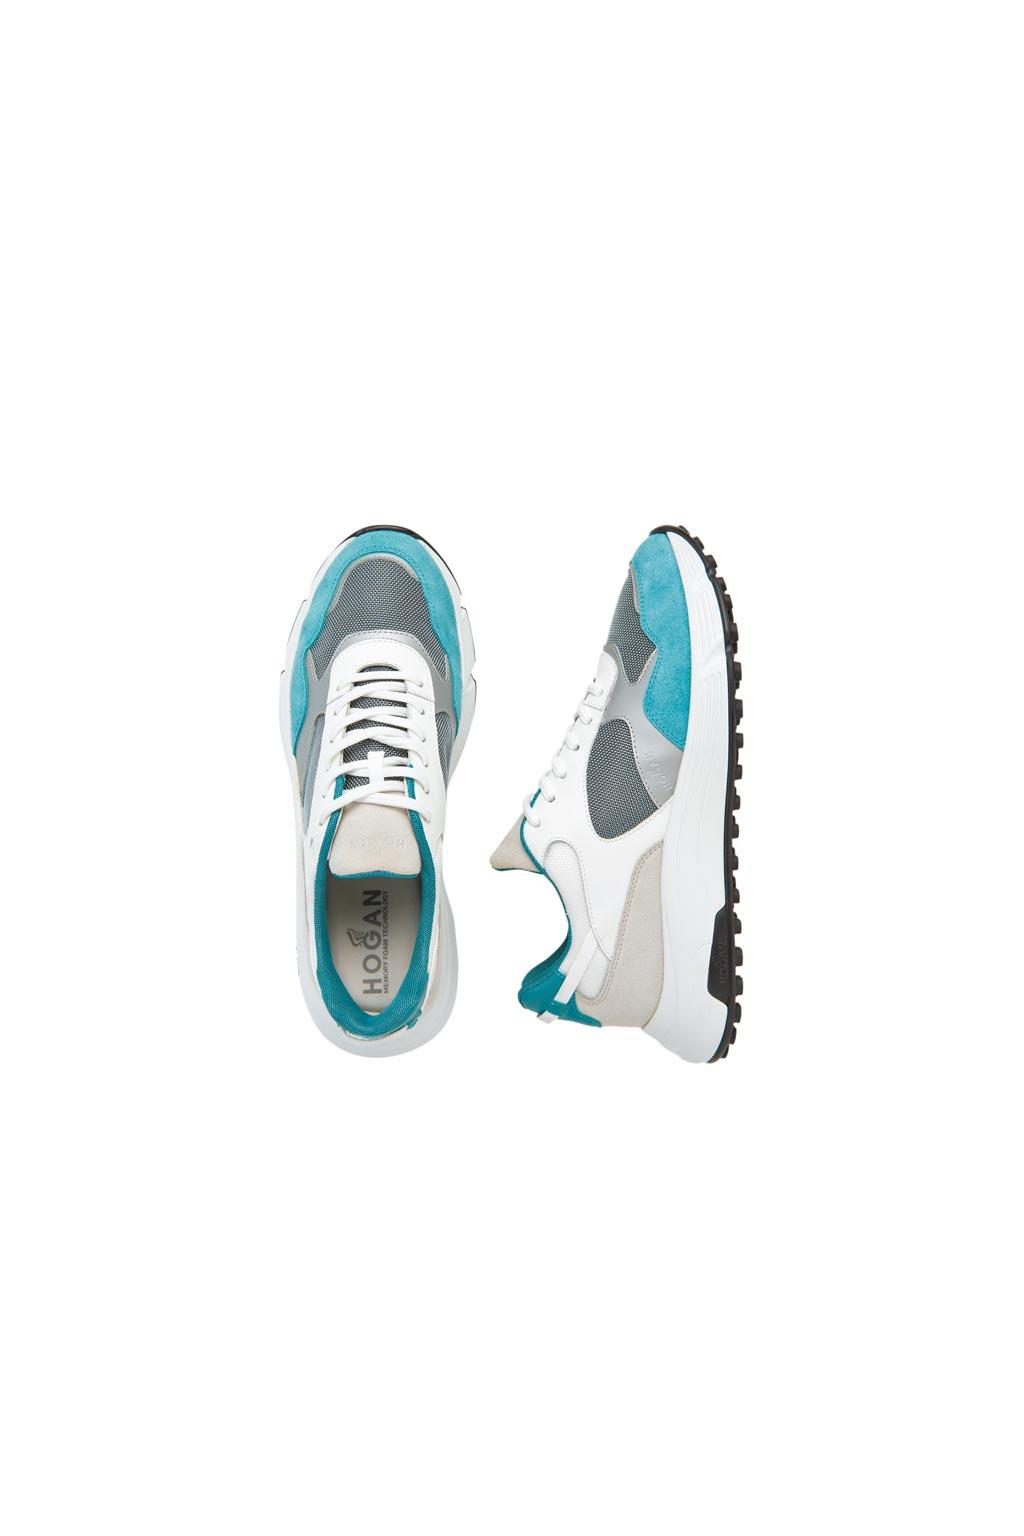 HOGAN Hyperlight淺藍色麂皮休閒鞋,1萬8900元。(HOGAN提供)